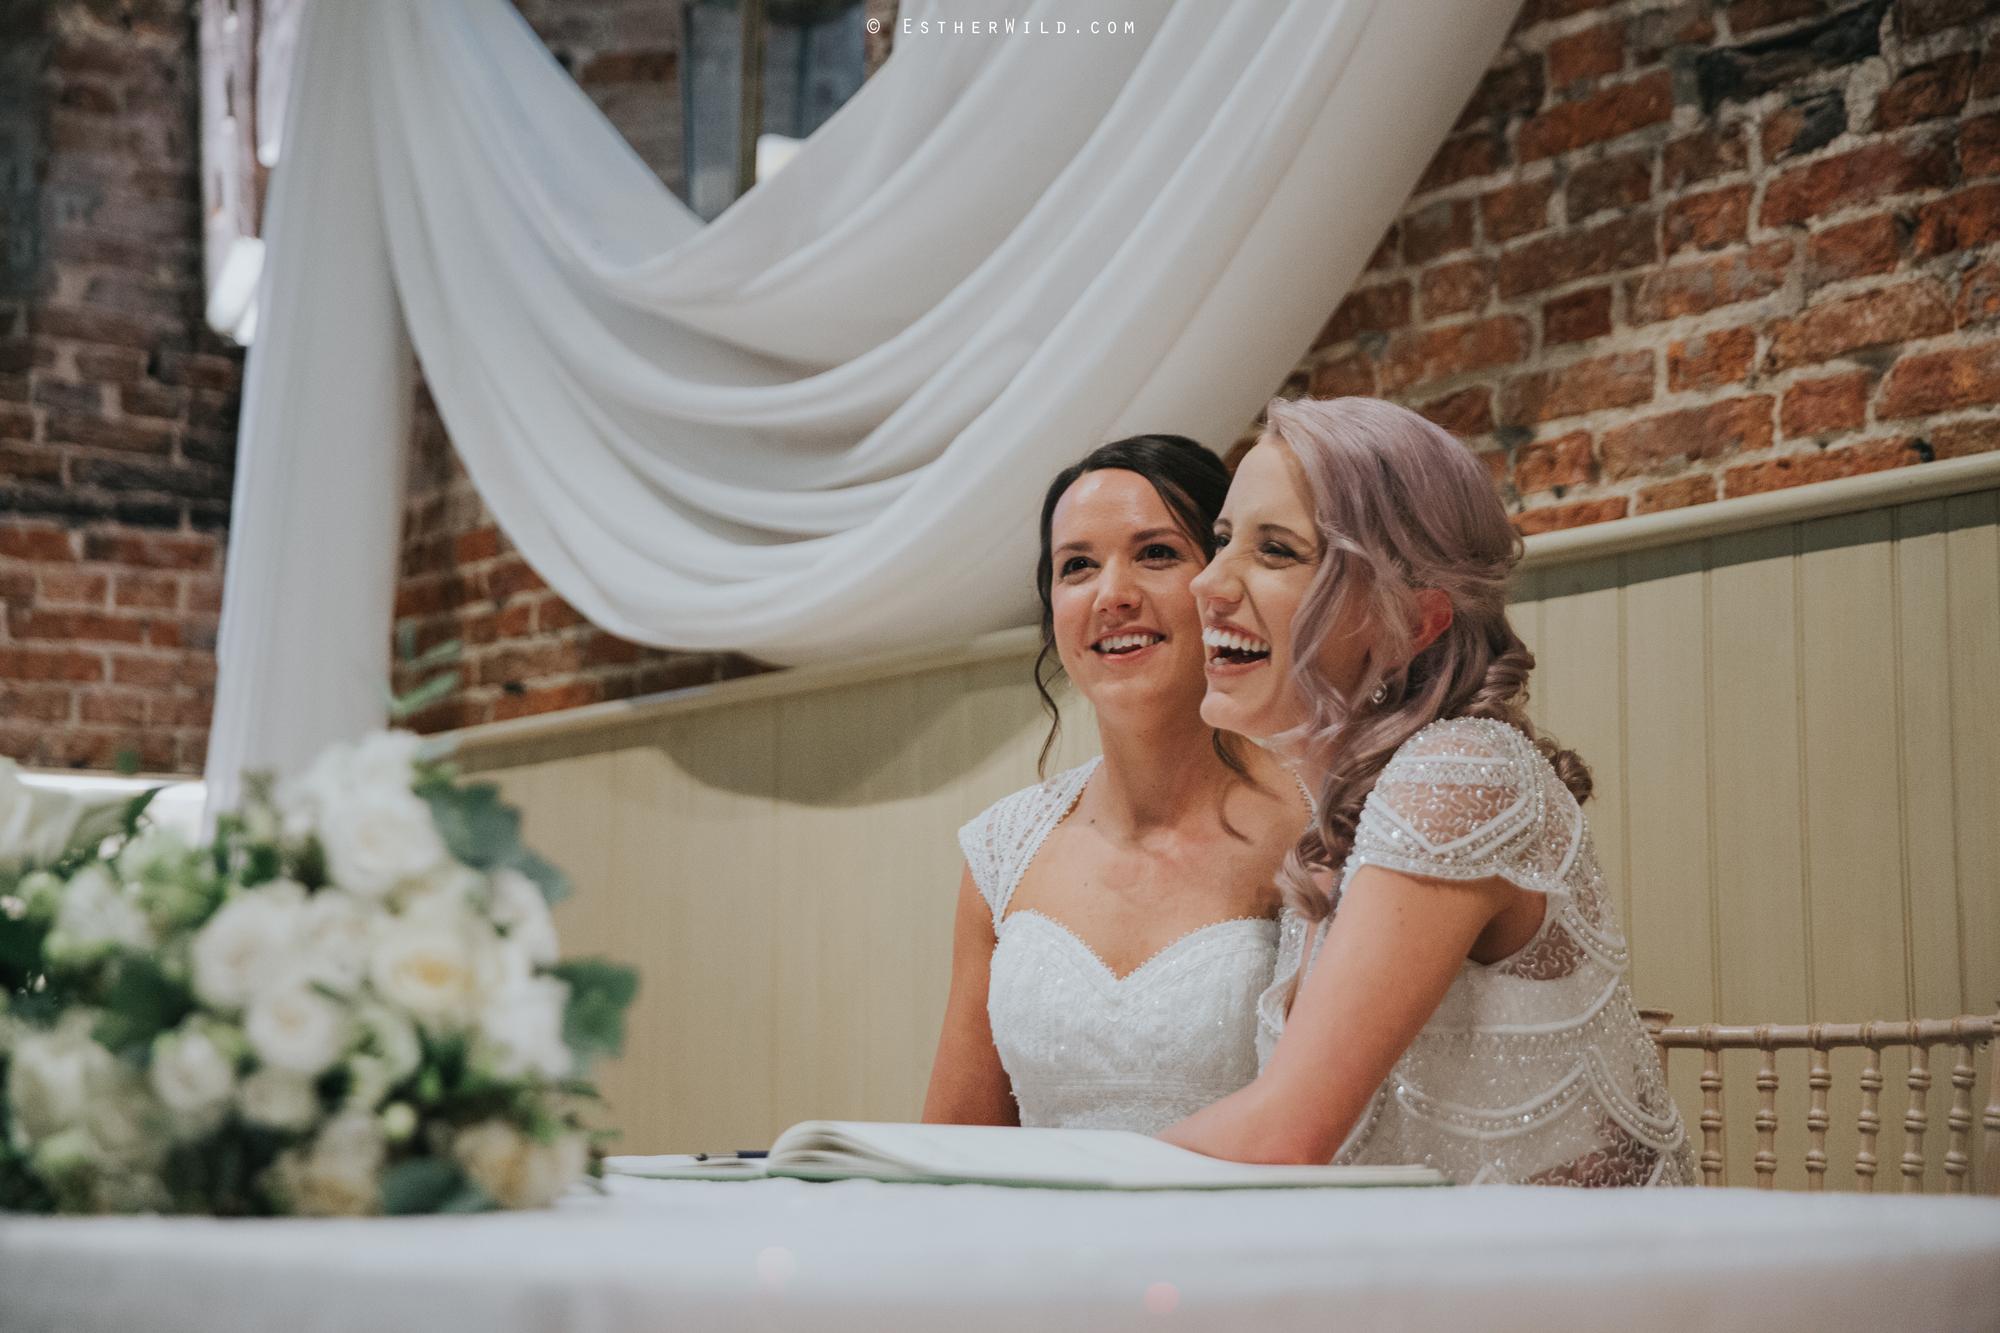 Elms_Barn_Weddings_Suffolk_Photographer_Copyright_Esther_Wild_IMG_1341.jpg